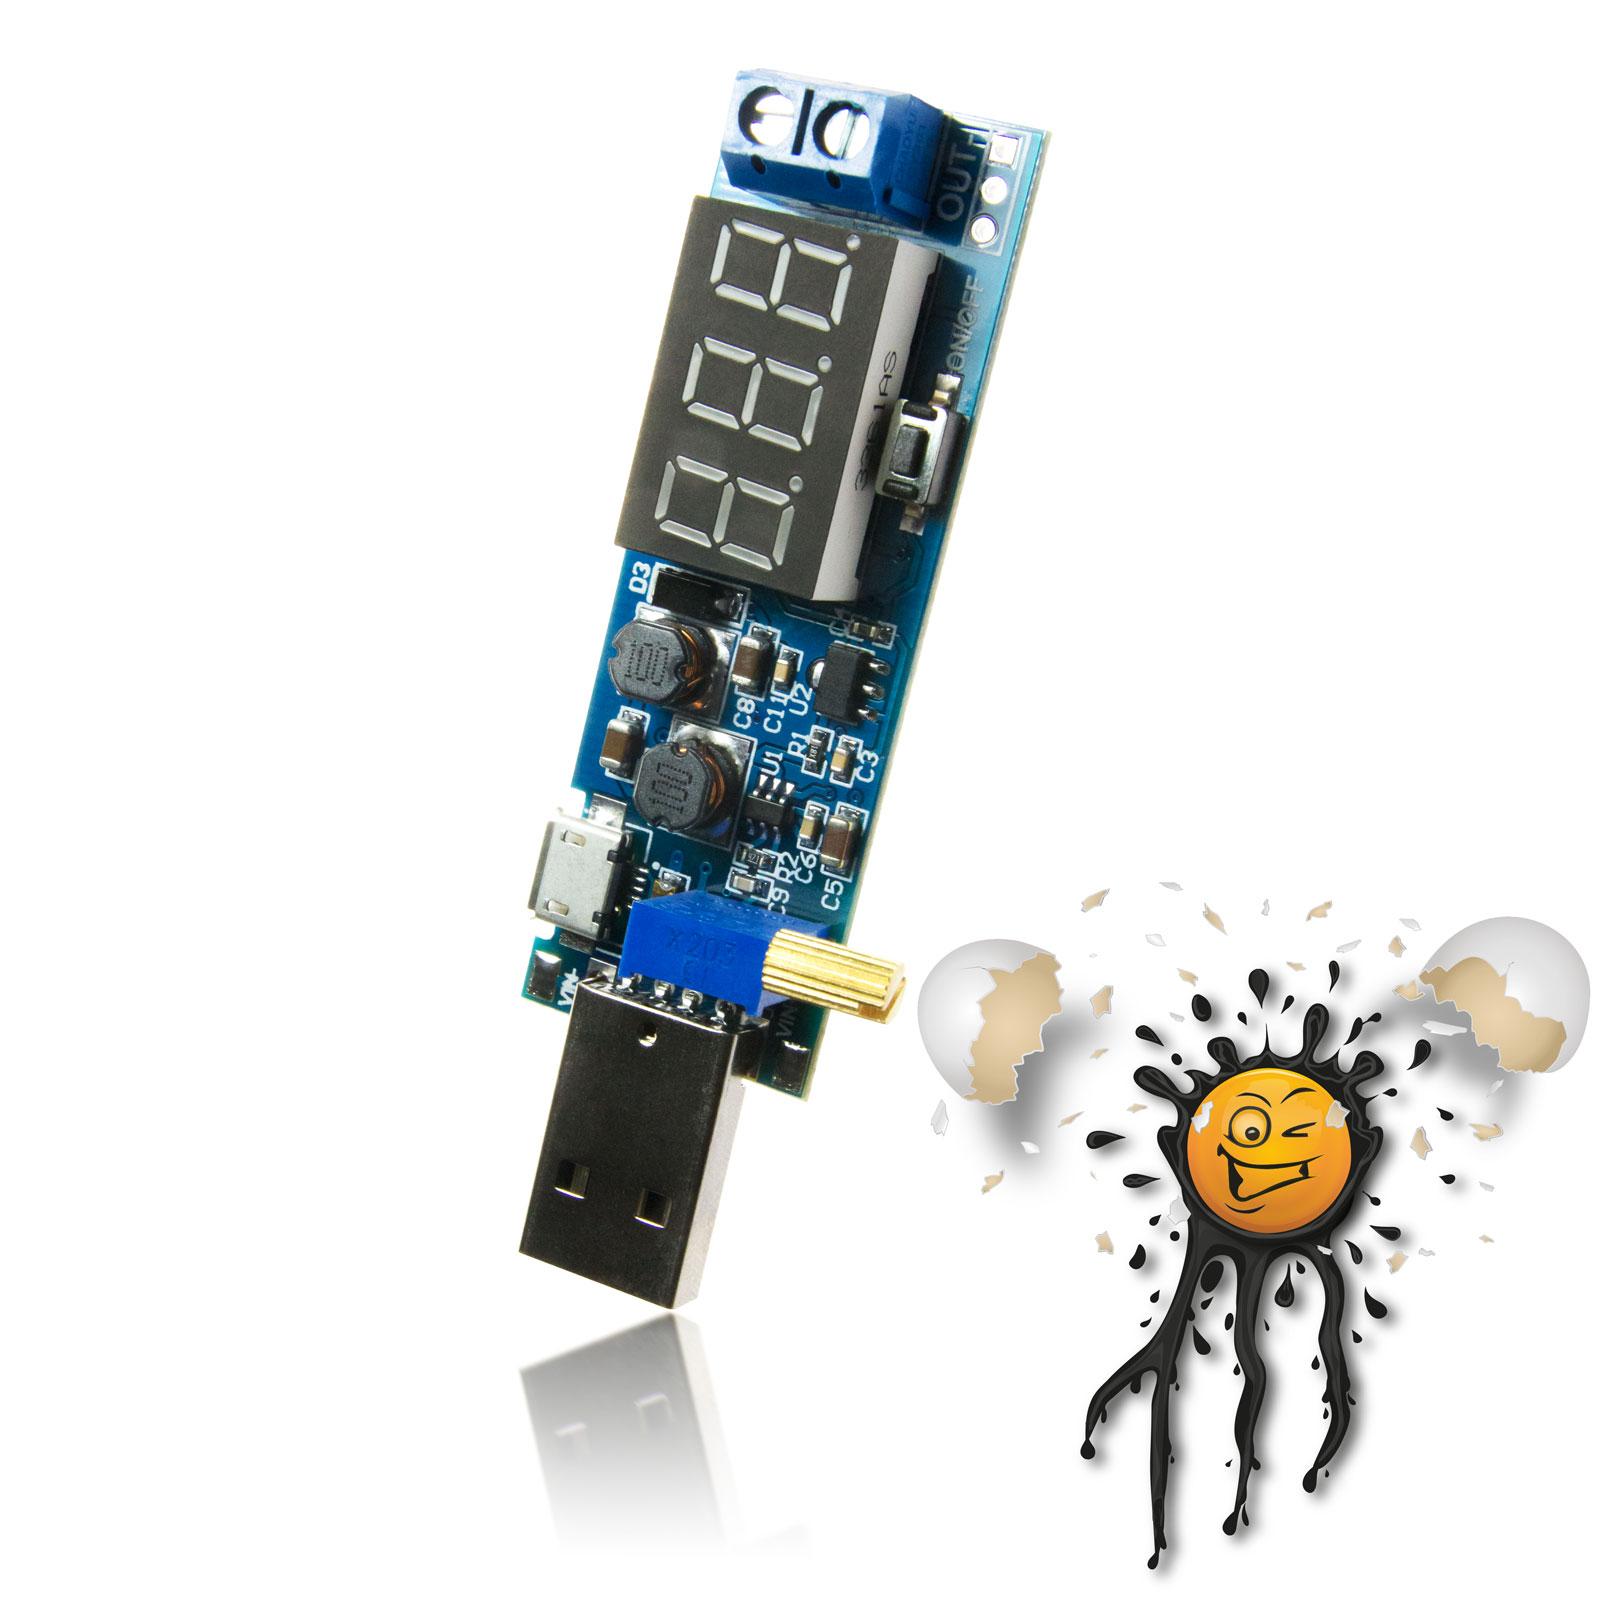 USB 1.2V - 24V Boost Konverter mit Voltanzeige